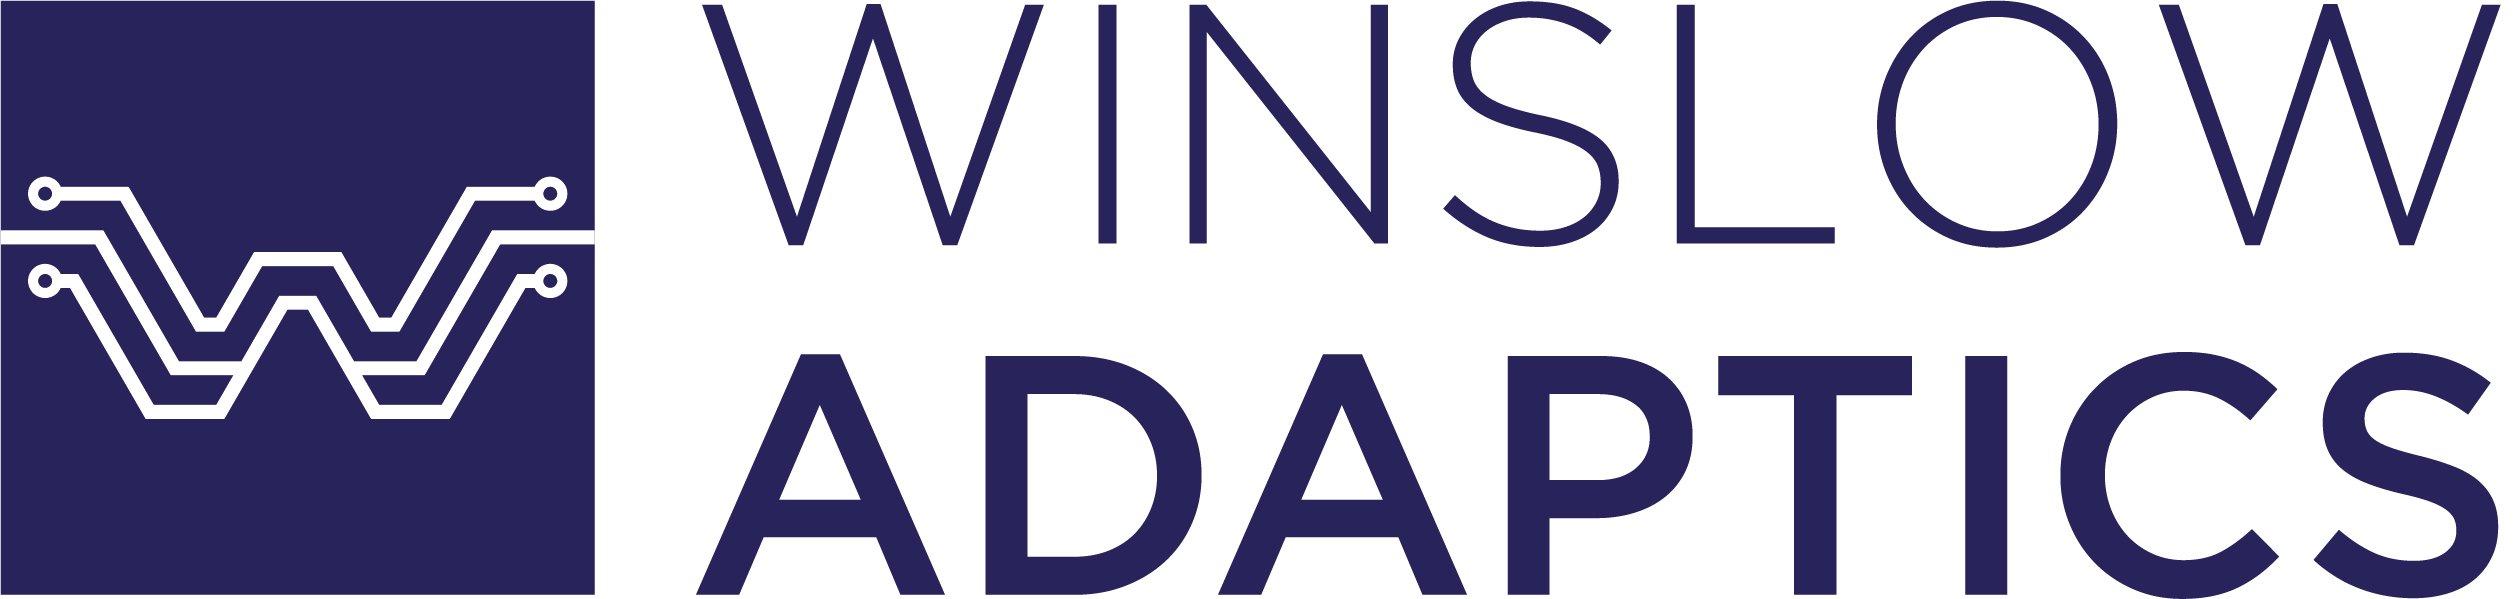 Winslow boxed horizontal logo